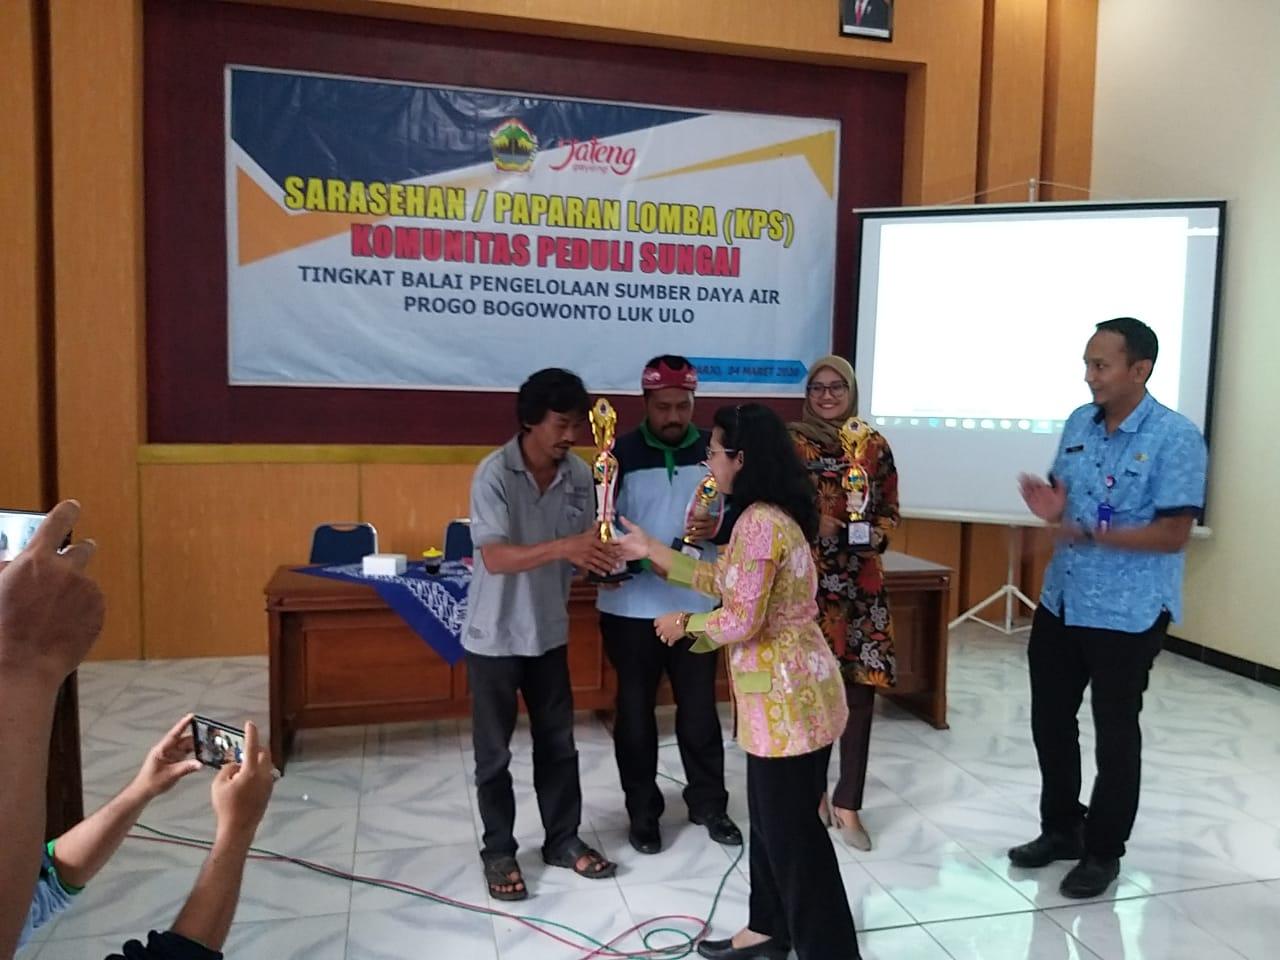 KKBM Kota Magelang Juara 1 Lomba Komunitas Peduli Sungai